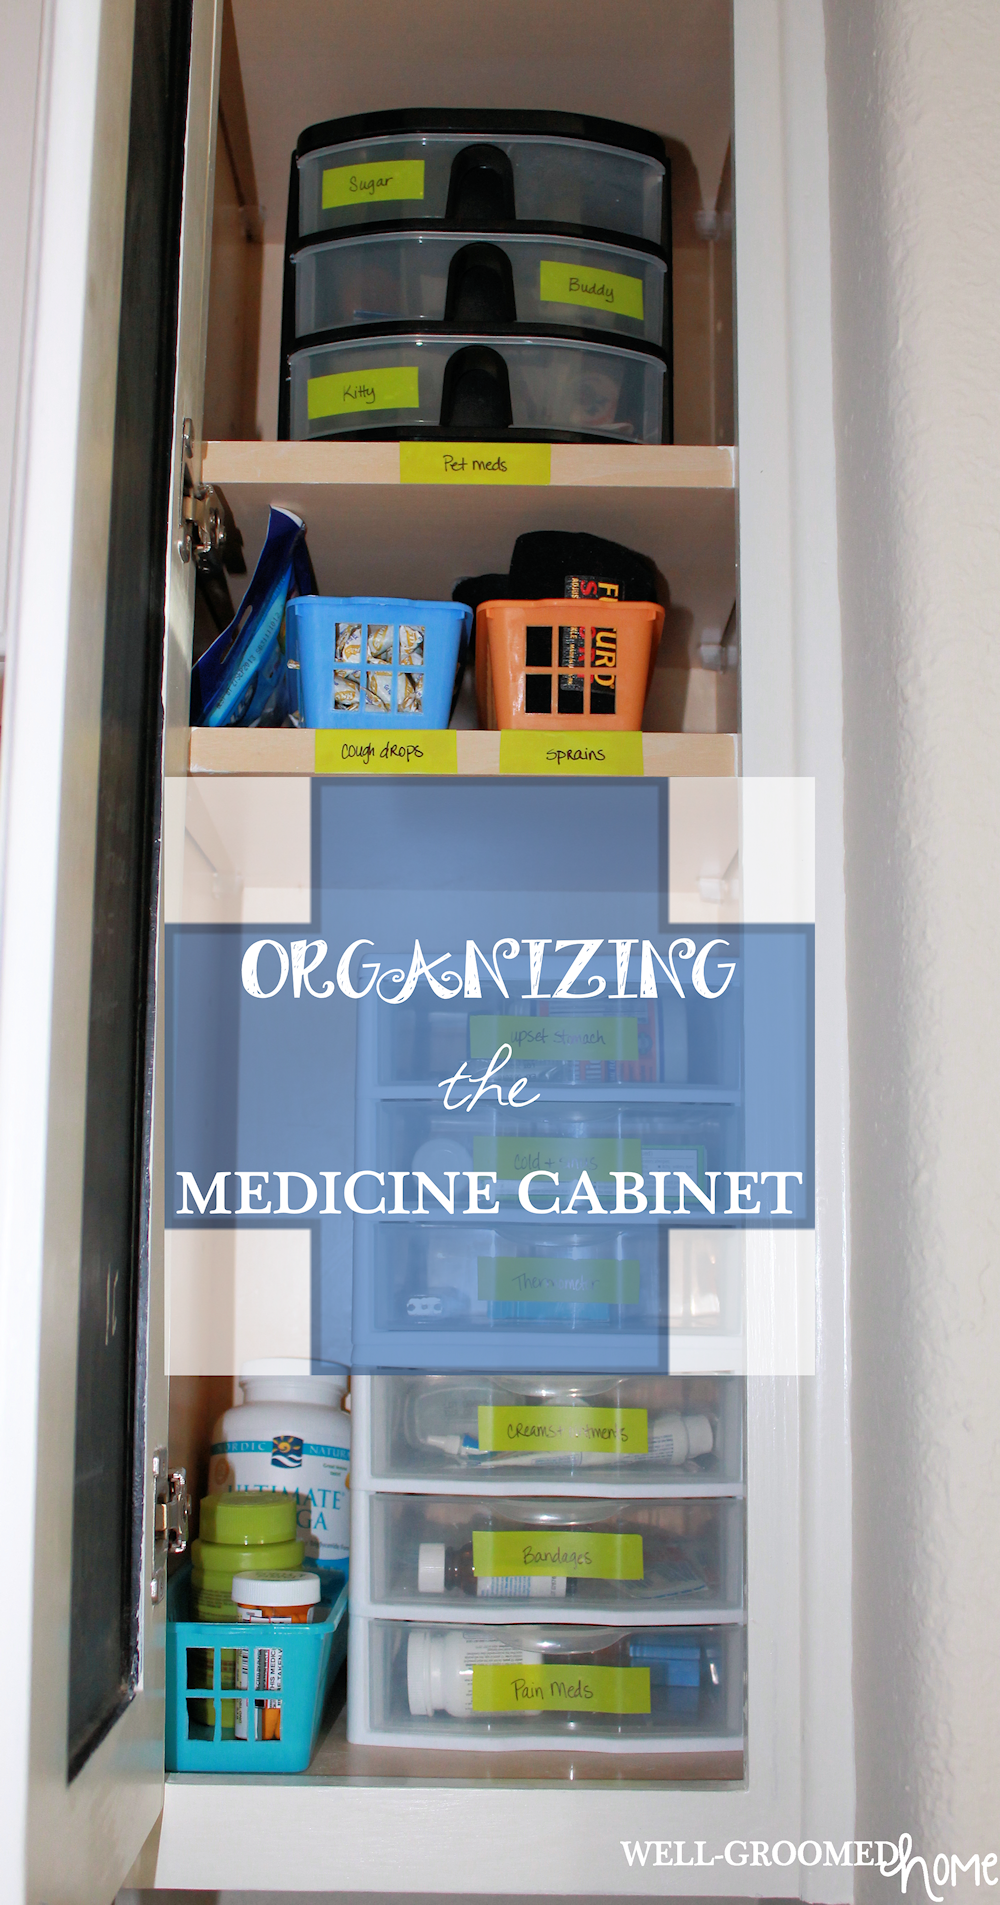 Organizing the Medicine Cabinet | Organization | Pinterest ...